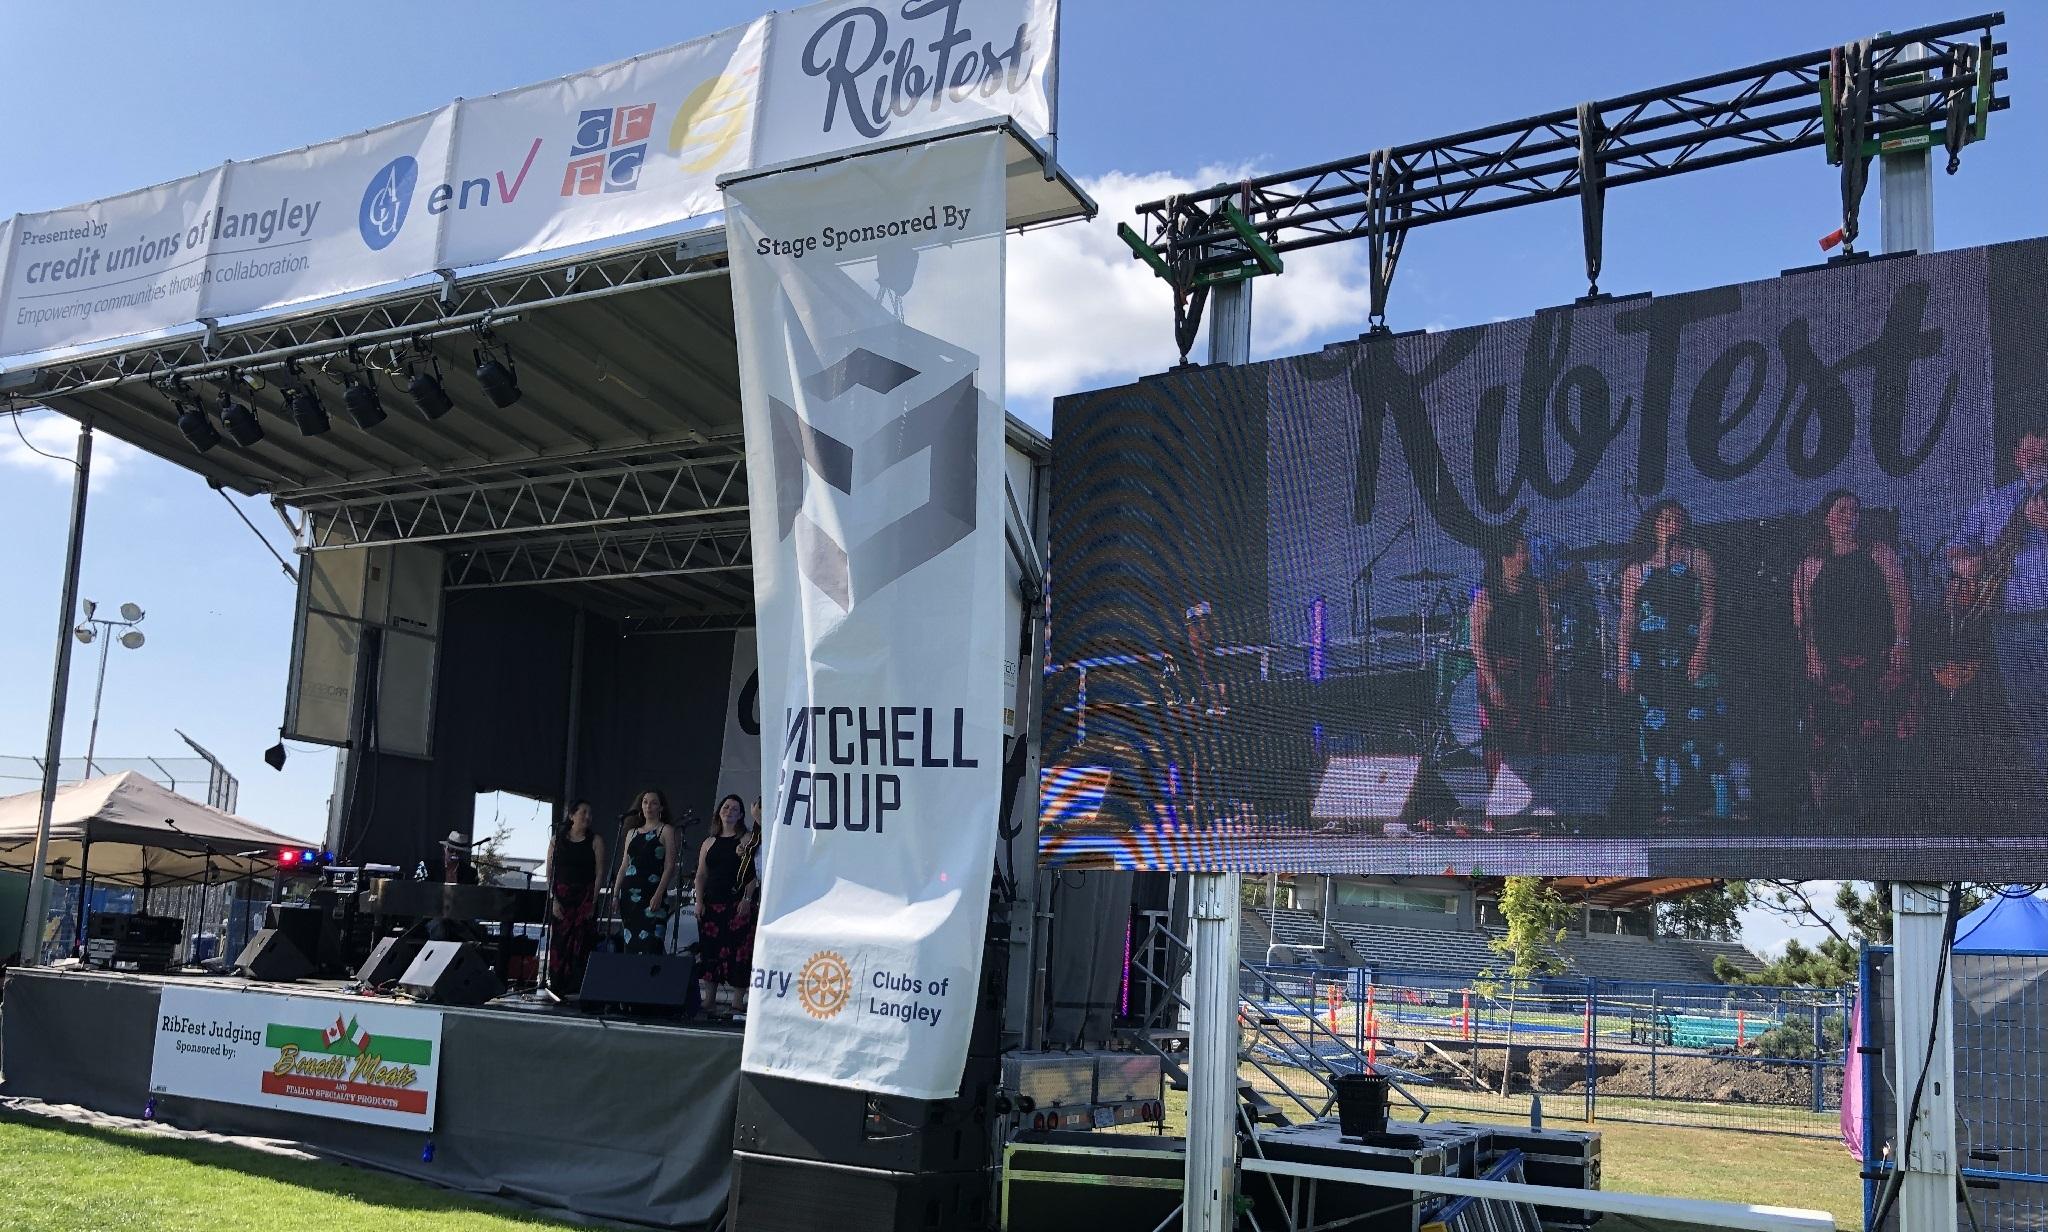 Rib Fest Langley